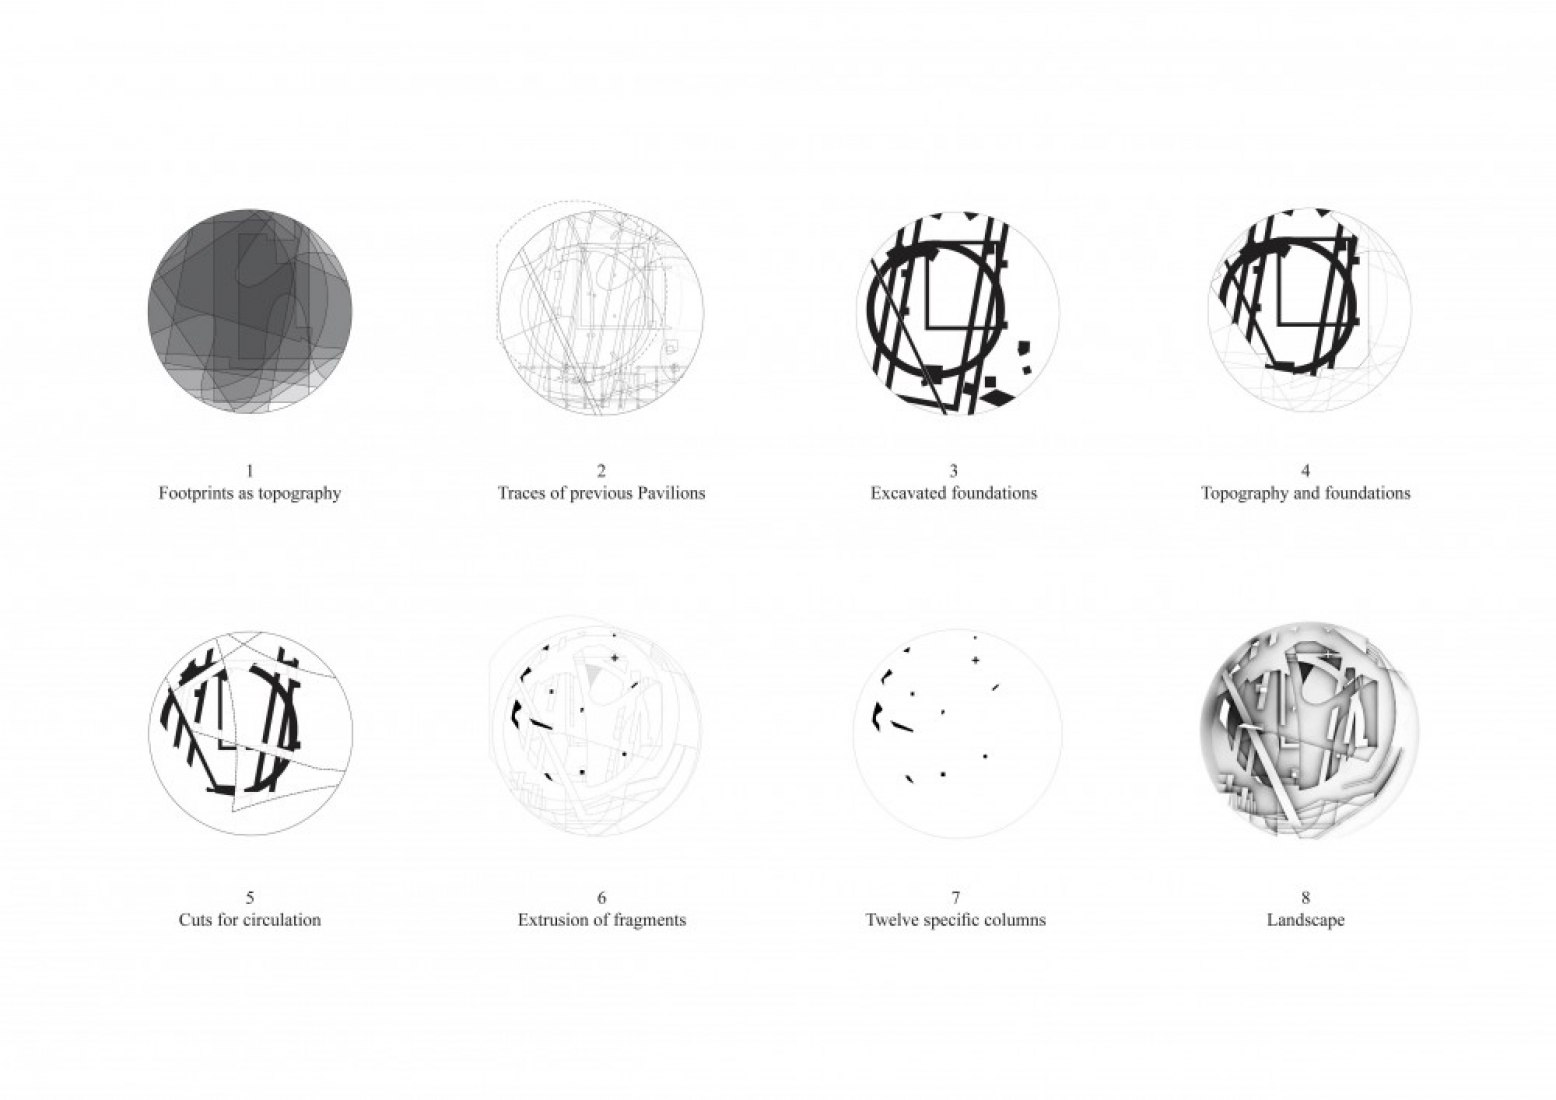 Diagram plan. Serpentine Gallery Pavilion 2012 Designed by Herzog & de Meuron and Ai Weiwei.